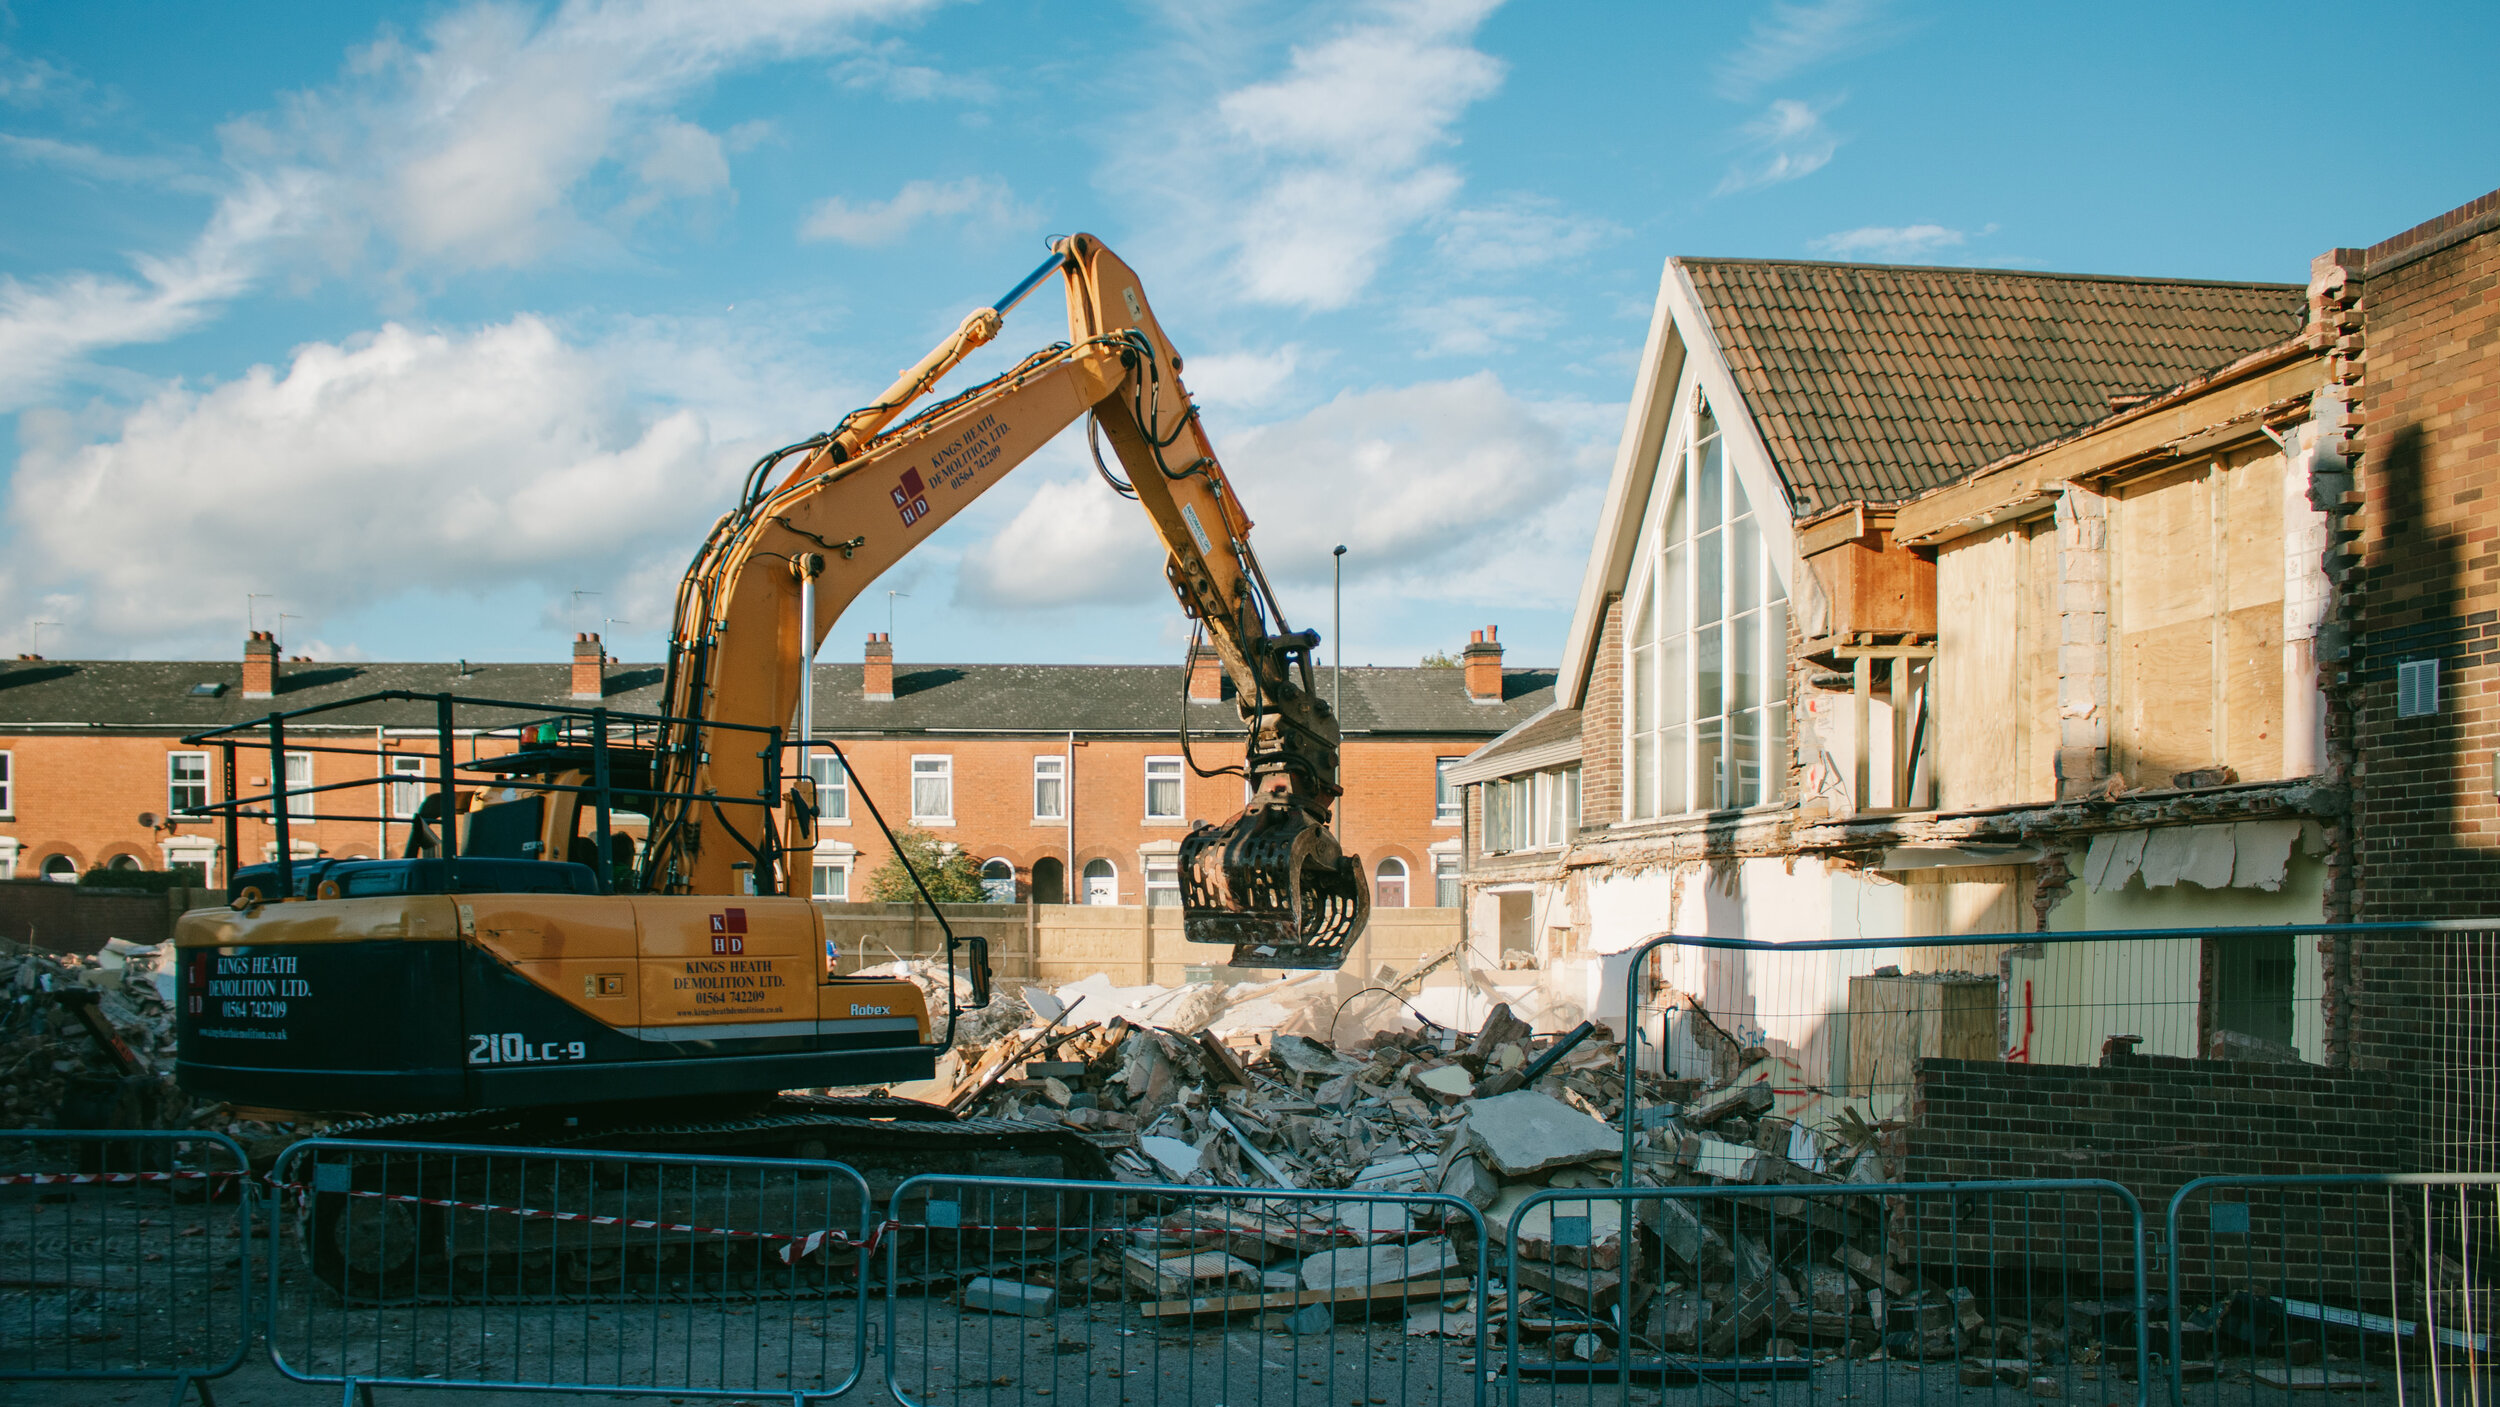 st-johns-harborne-bfm-demolition-oct-19-eo-3072-2-low.jpg